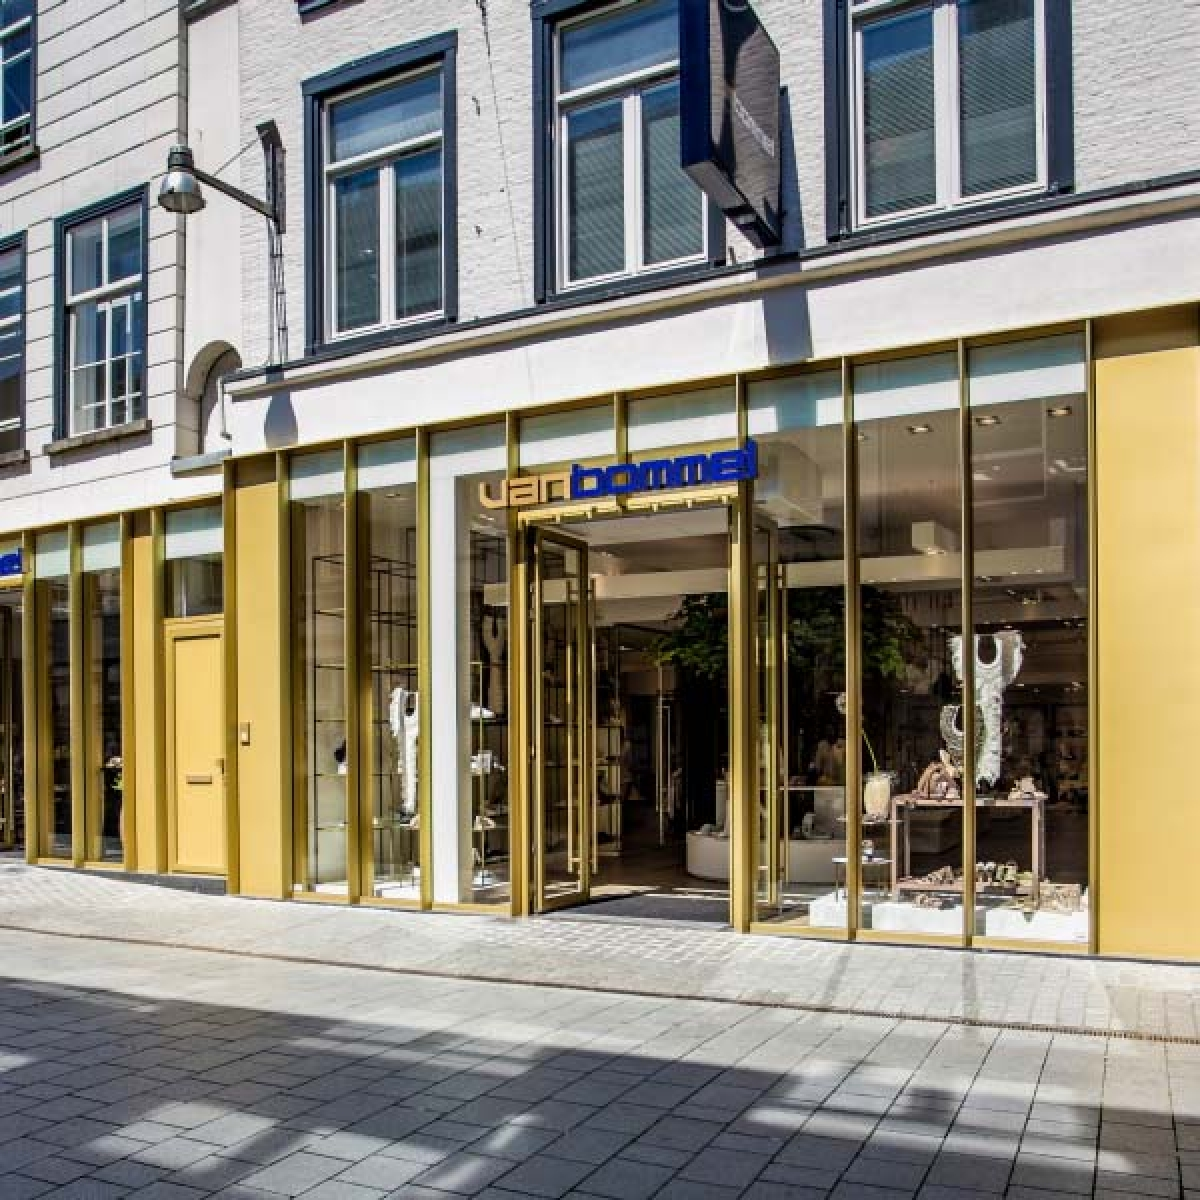 Van Bommel winkelpui